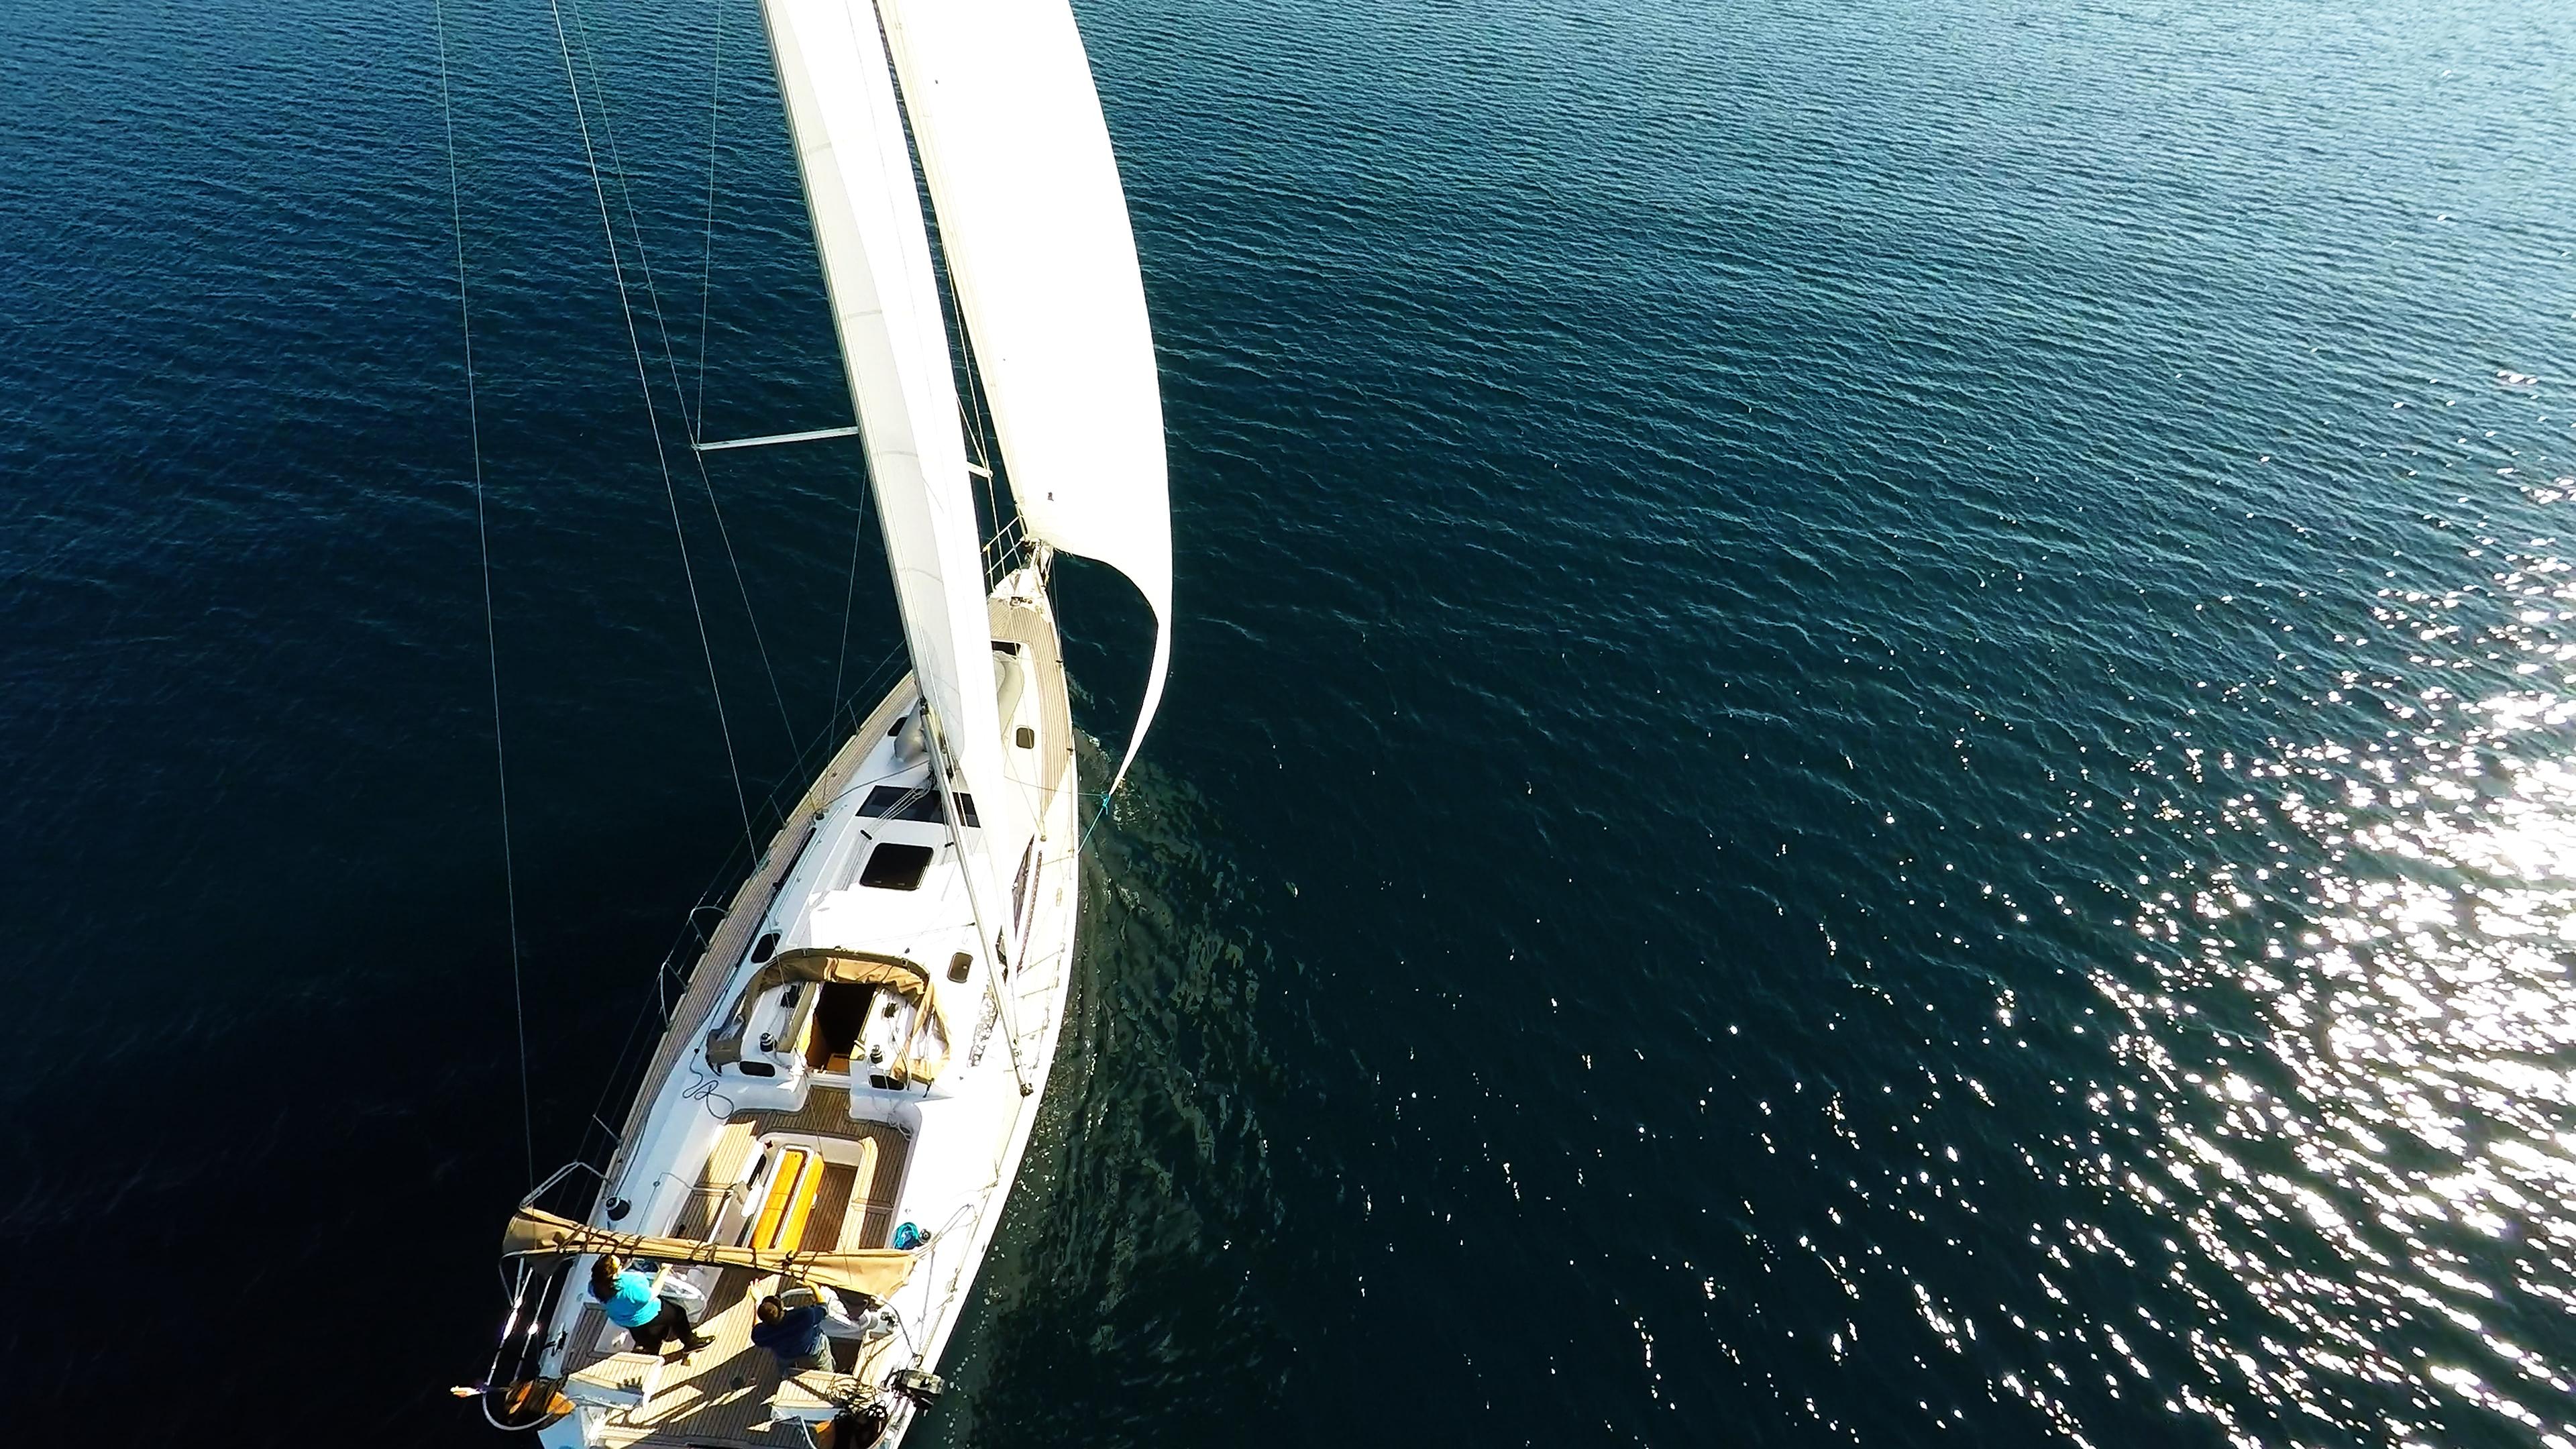 barcha a vela yacht a vela elan 45 impression albero sartiame vele